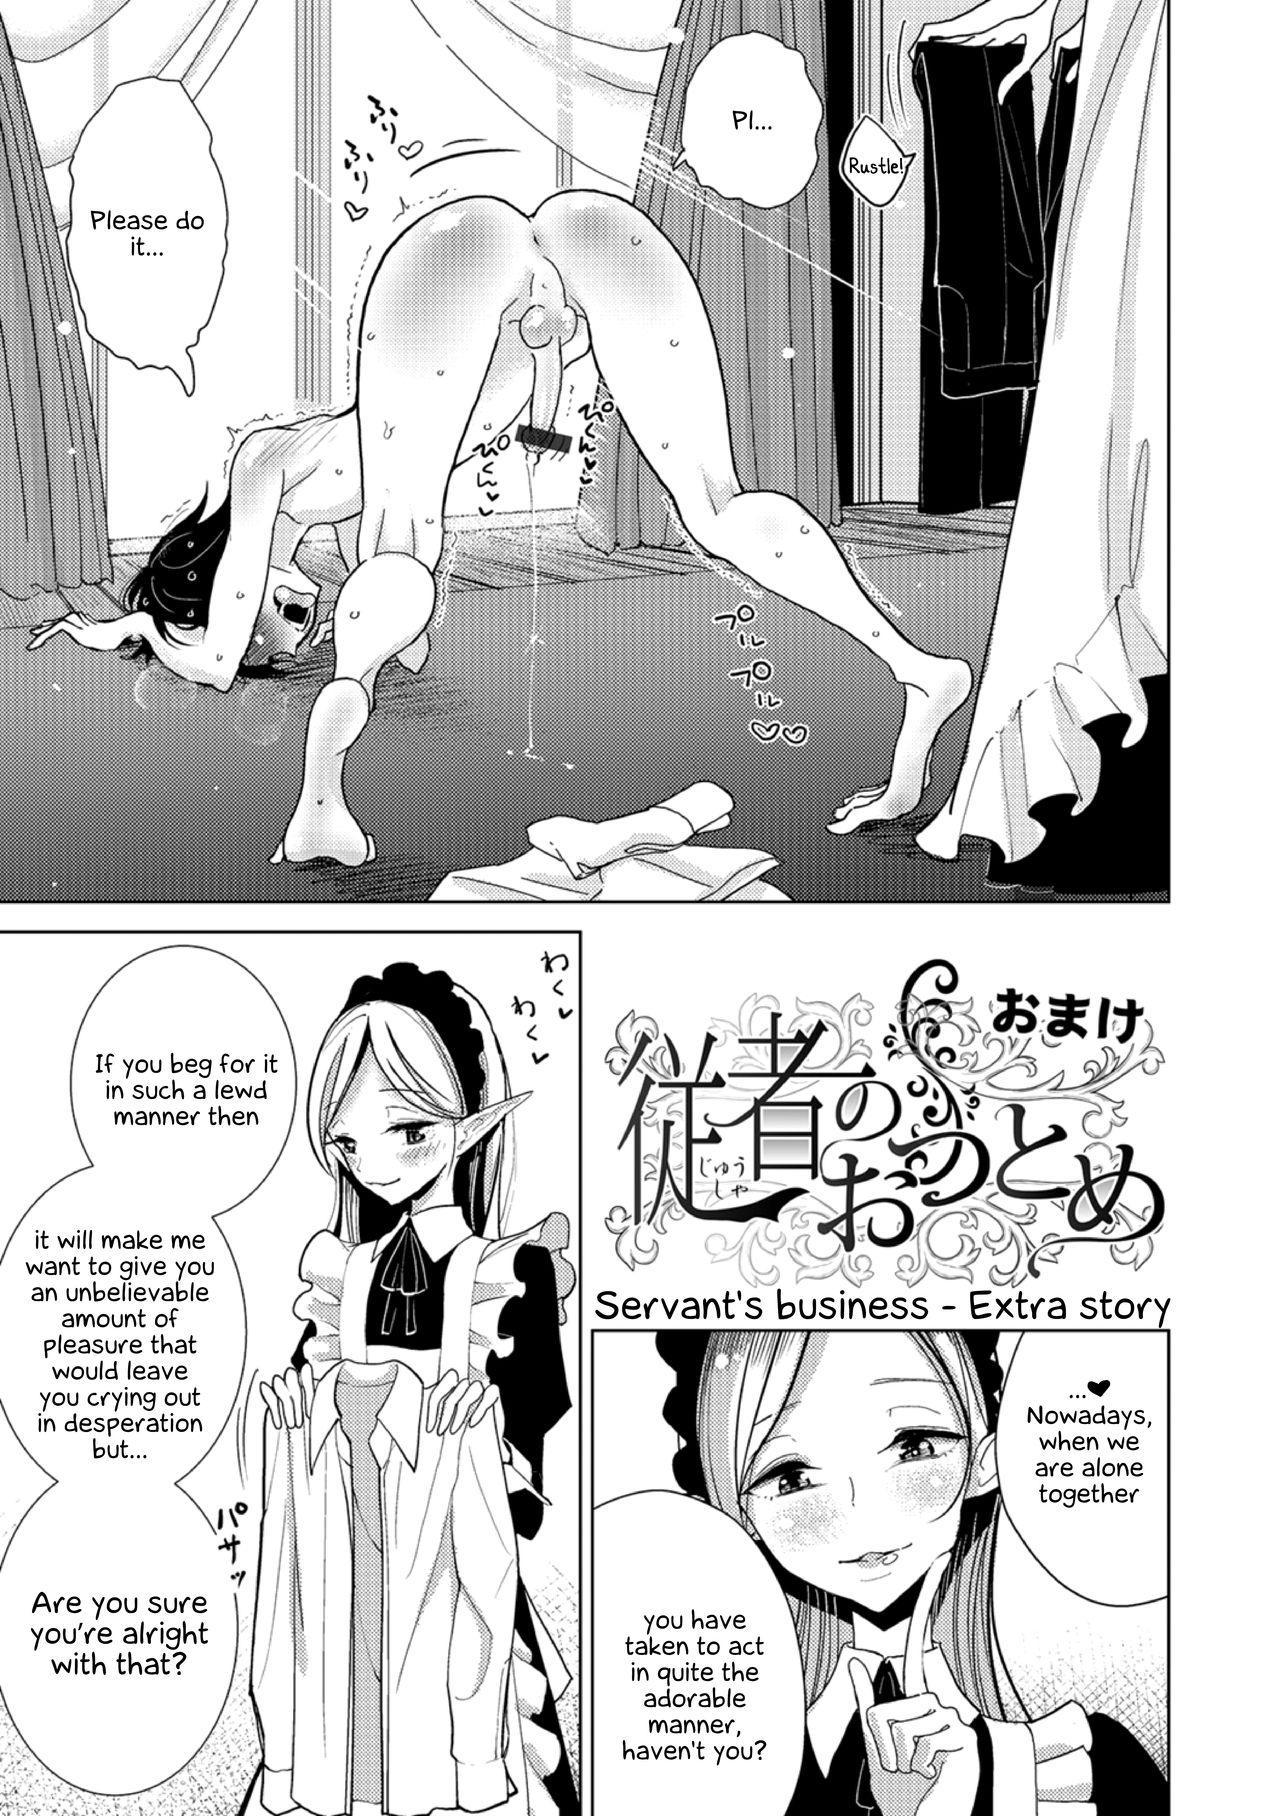 [Dhibi] Kadou kyoushitsu shide mitsu-ryuu | Flower arrangement classroom - The hanging nectar flow (Otokonoko HEAVEN Vol. 26) [English] [Godofloli] [Digital] 16